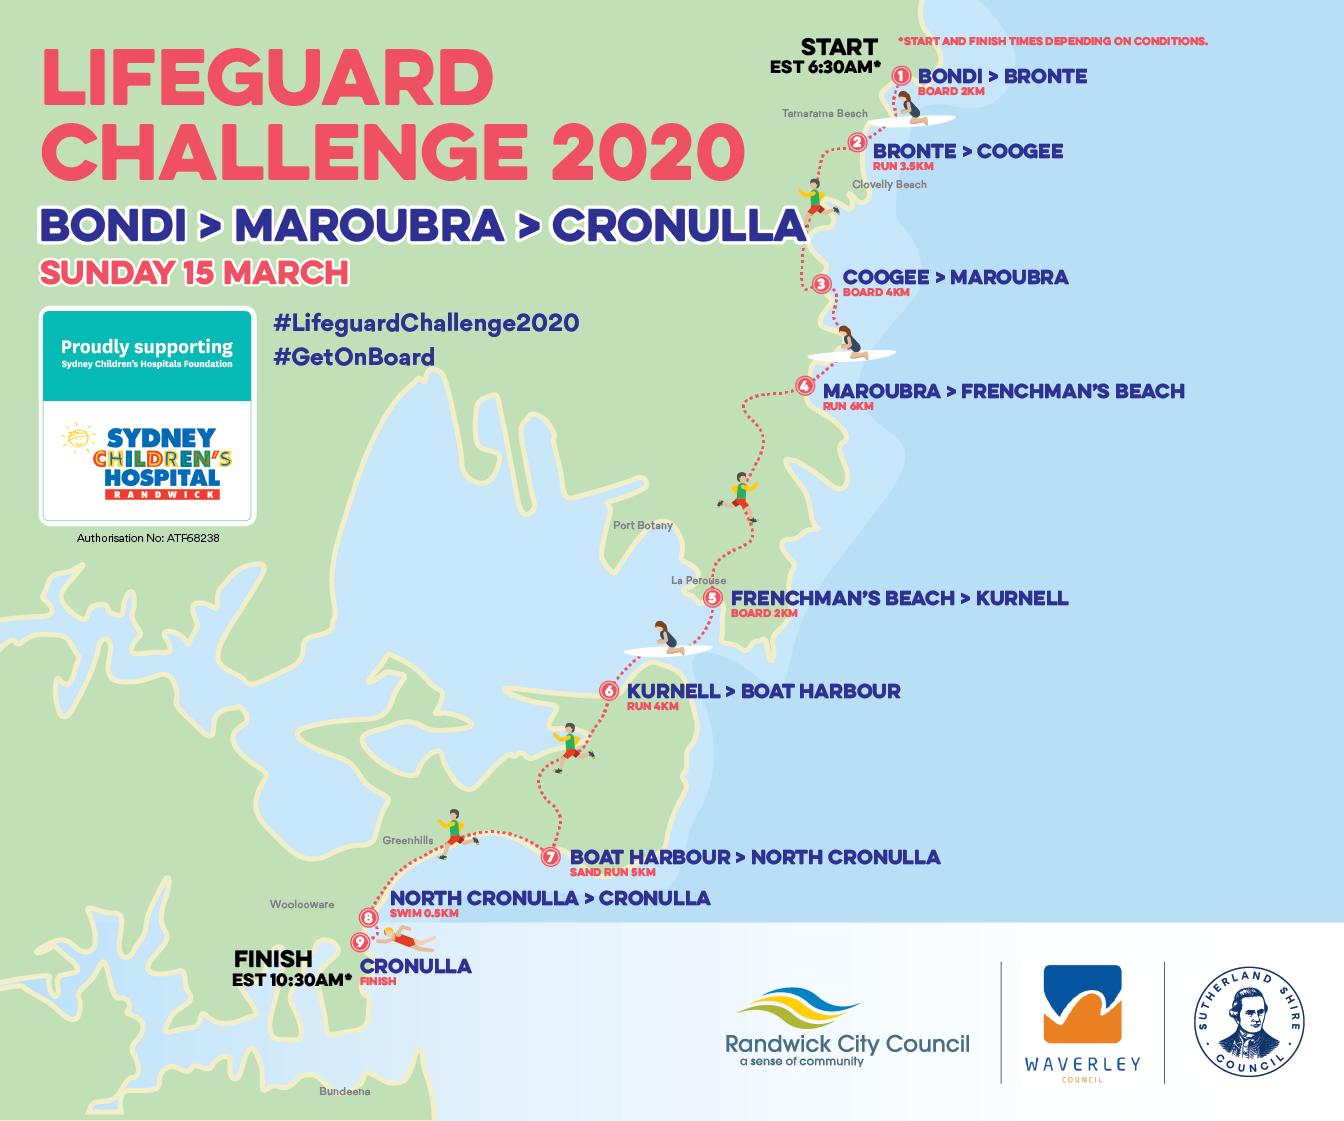 2020 Lifeguard Challenge map